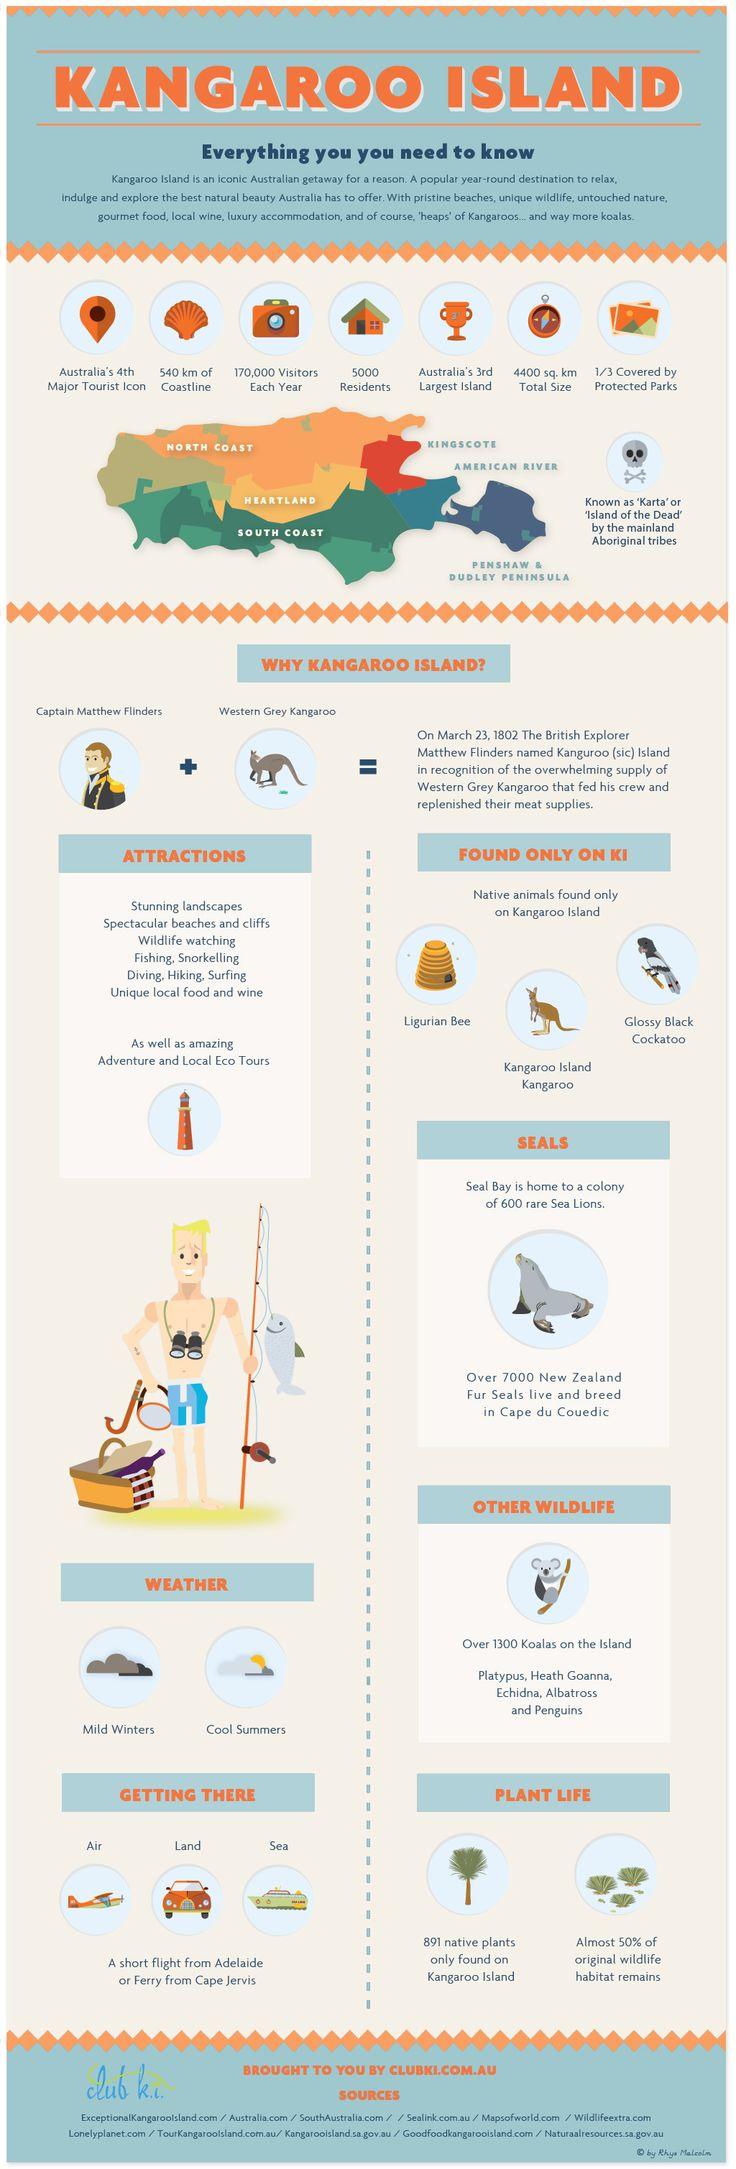 How To Create and Promote an Infographic --> Blog Post coming soon! #KangarooIsland #KangarooIslandInfographic #infographic